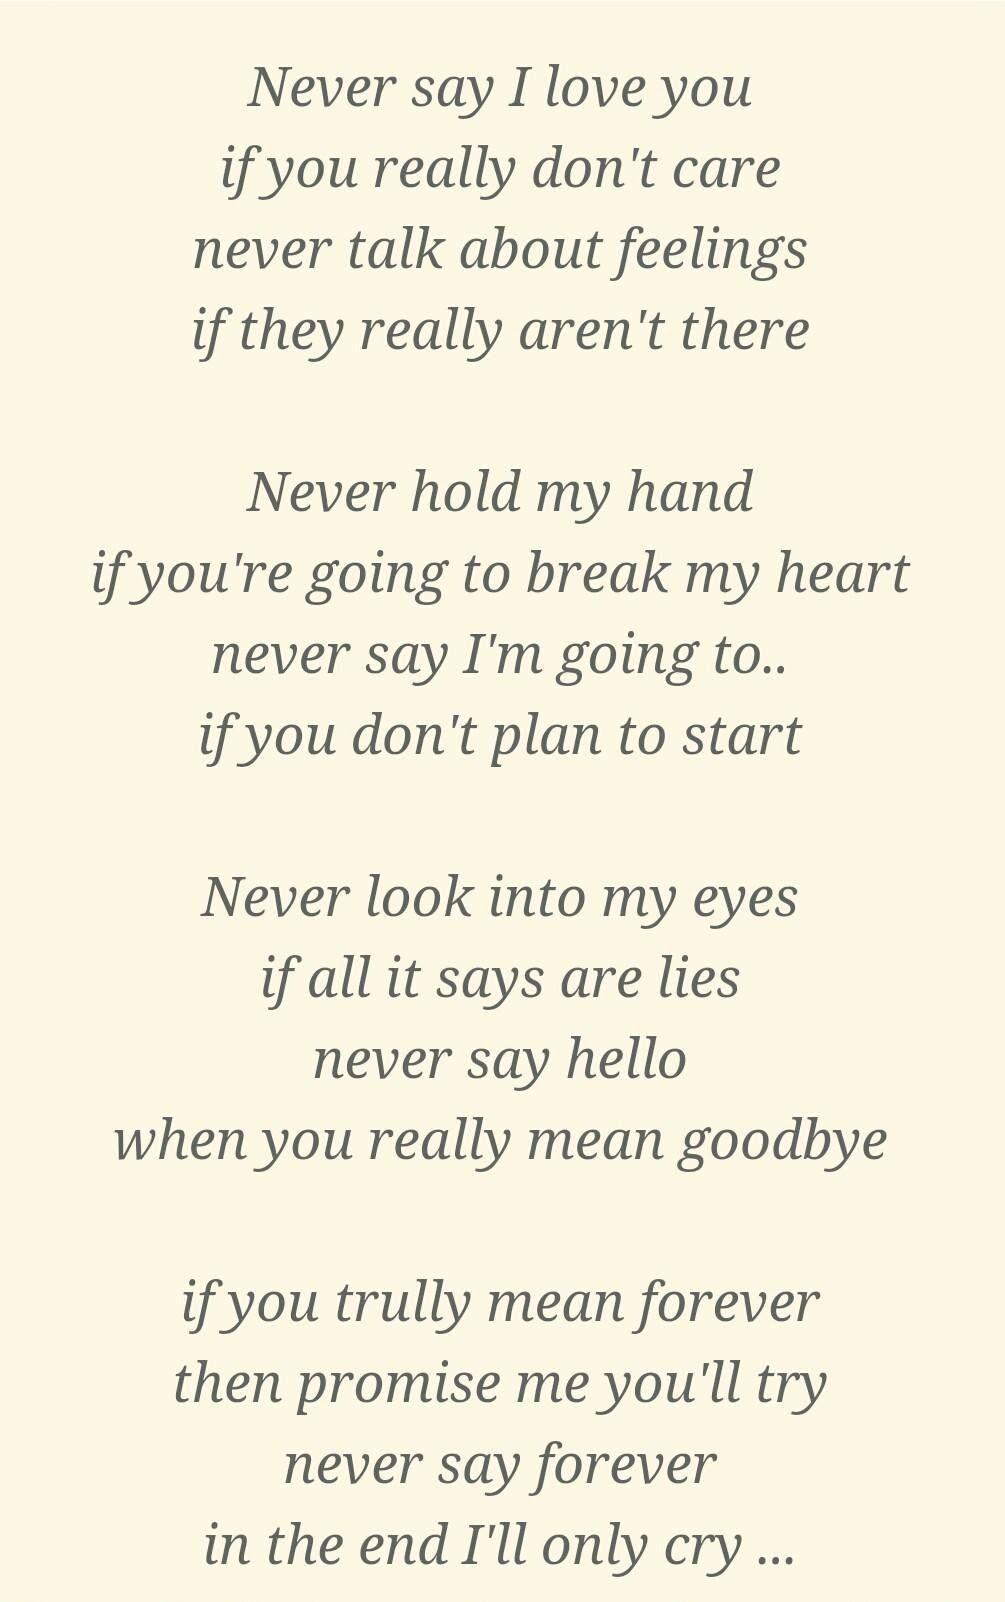 Image Result For Heartbreak Poems That Make You Cry Heartbreak Poems Poems Heartbreak